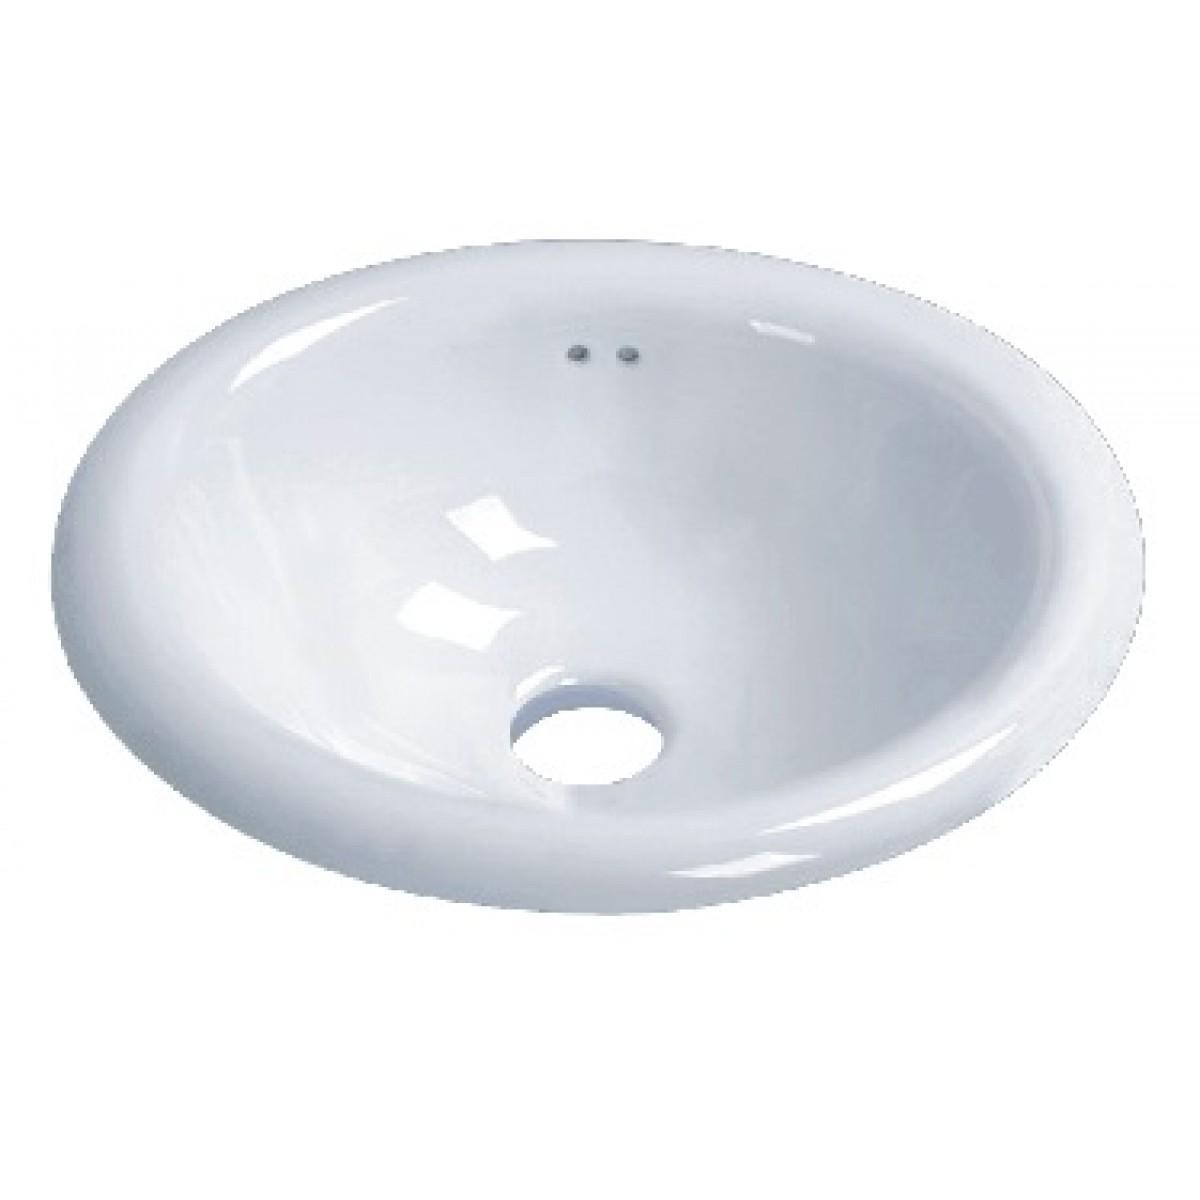 Porcelain Ceramic Vanity Drop In Bathroom Vessel Sink   17 1/2 X 15 X 7 1/2  Inch